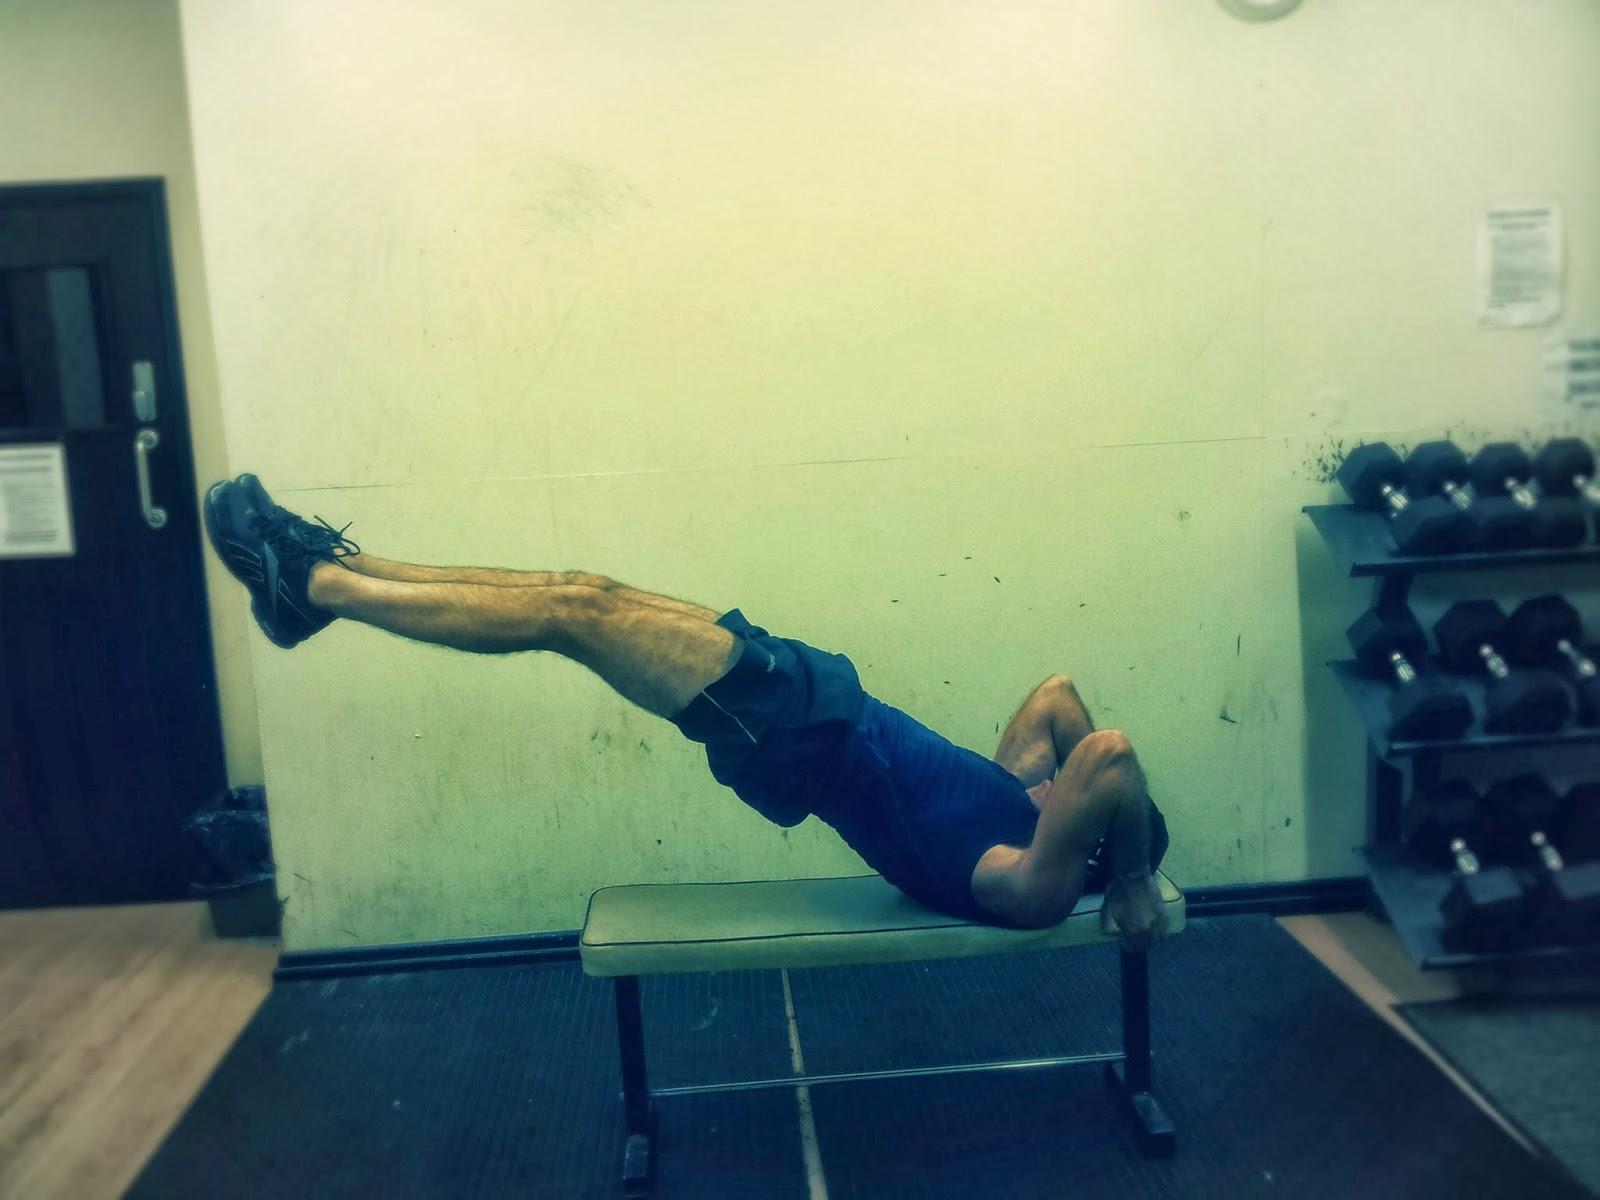 Start Bodyweight Training: Dragon Flags